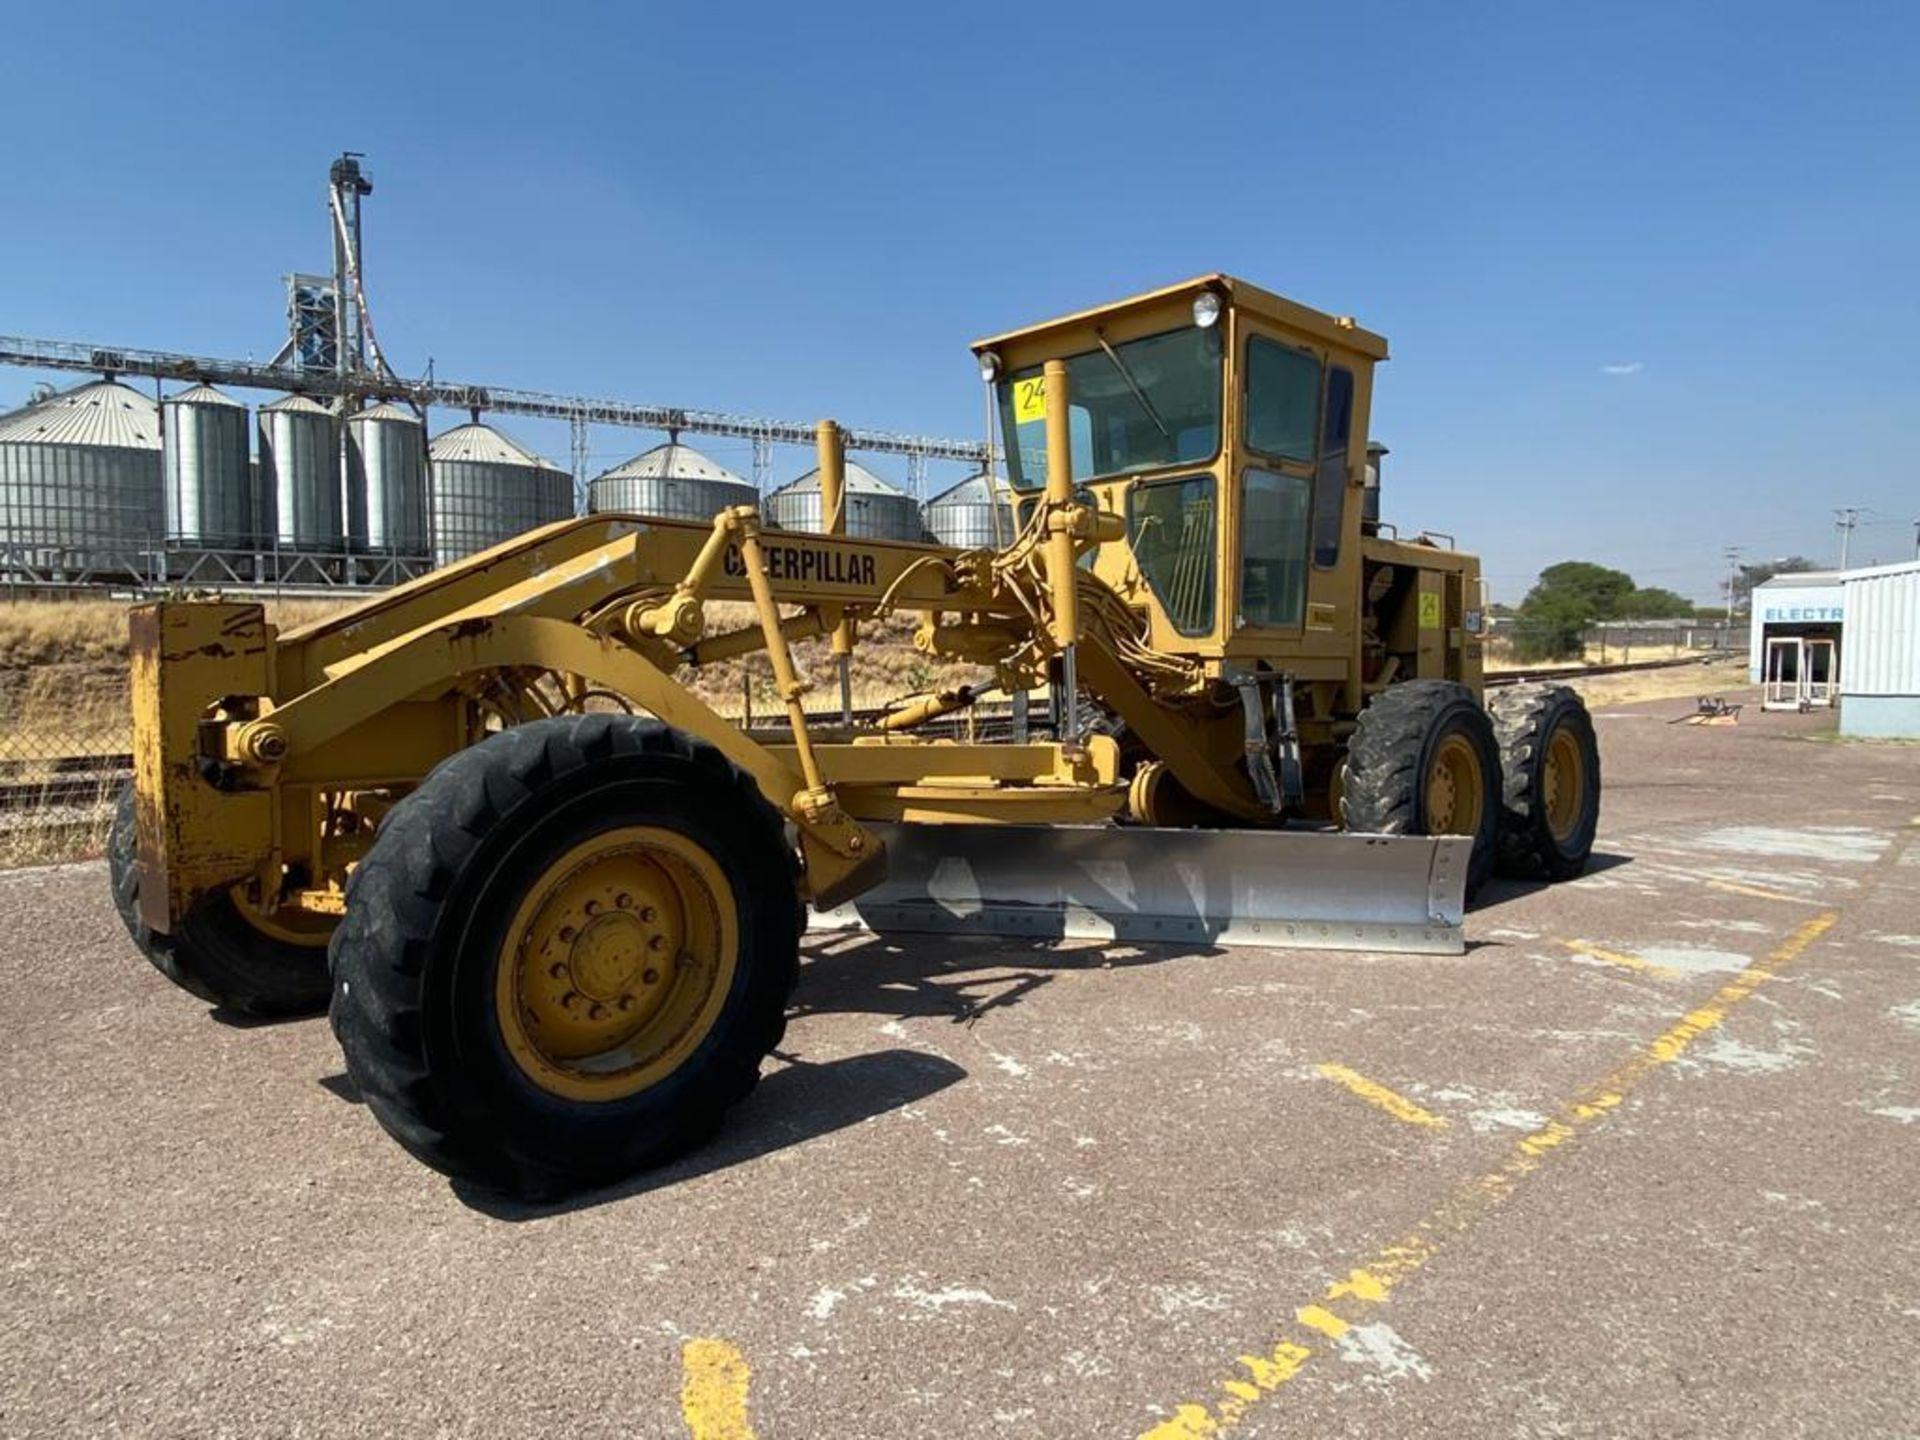 Caterpillar 120G Motor Grader, Serial number 87V09646, Motor number PQ883-2/07Z28983 - Image 7 of 61